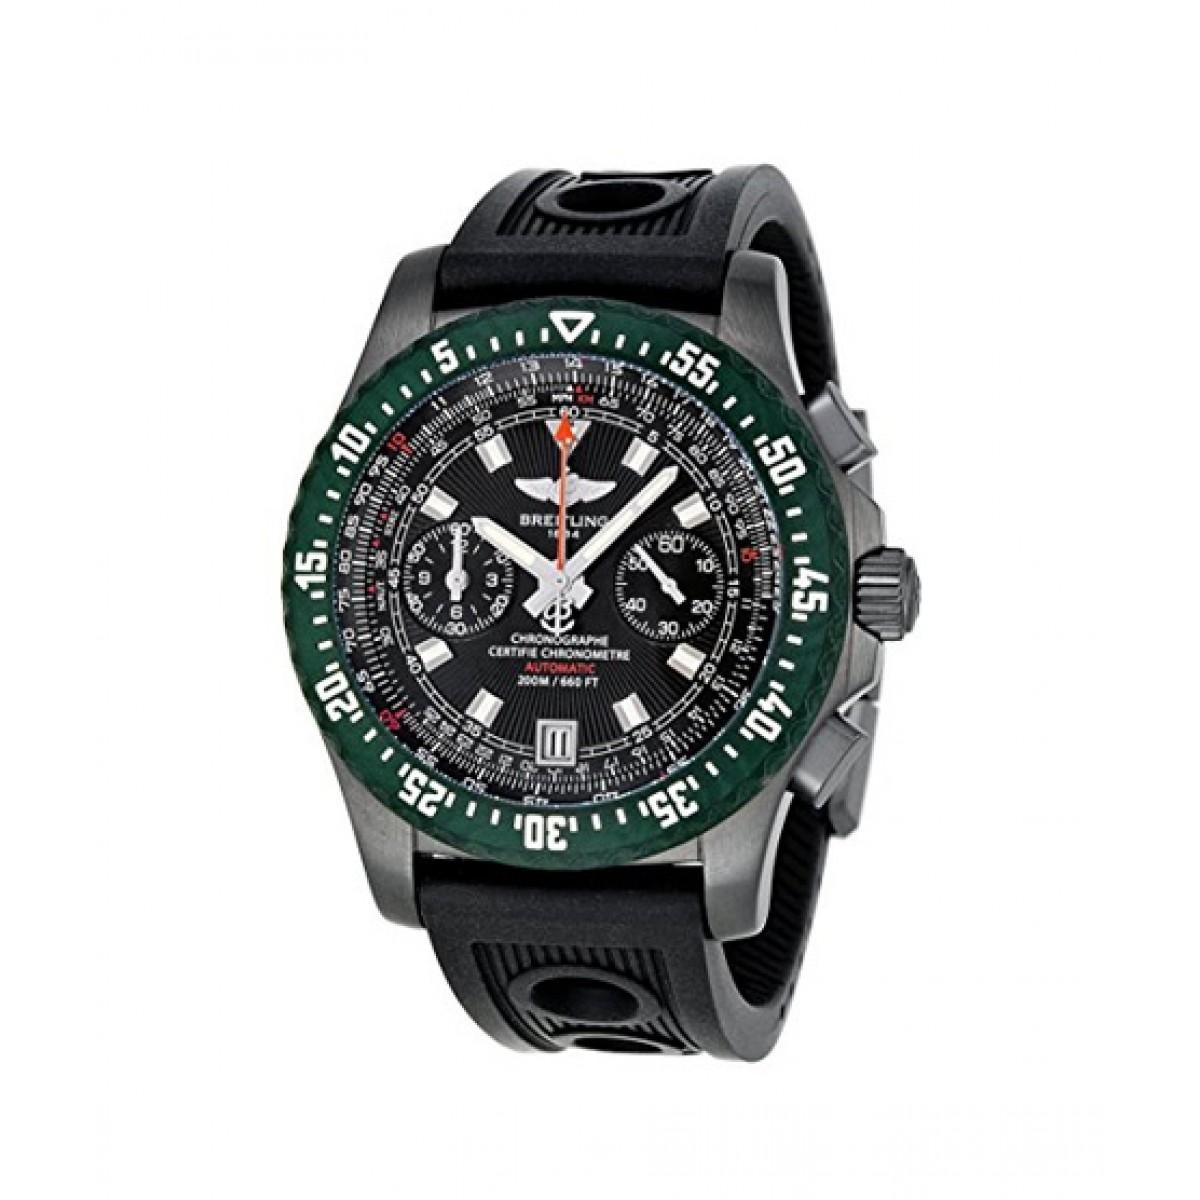 Breitling Skyracer Raven Men S Watch Black M27363a3 B823bkor